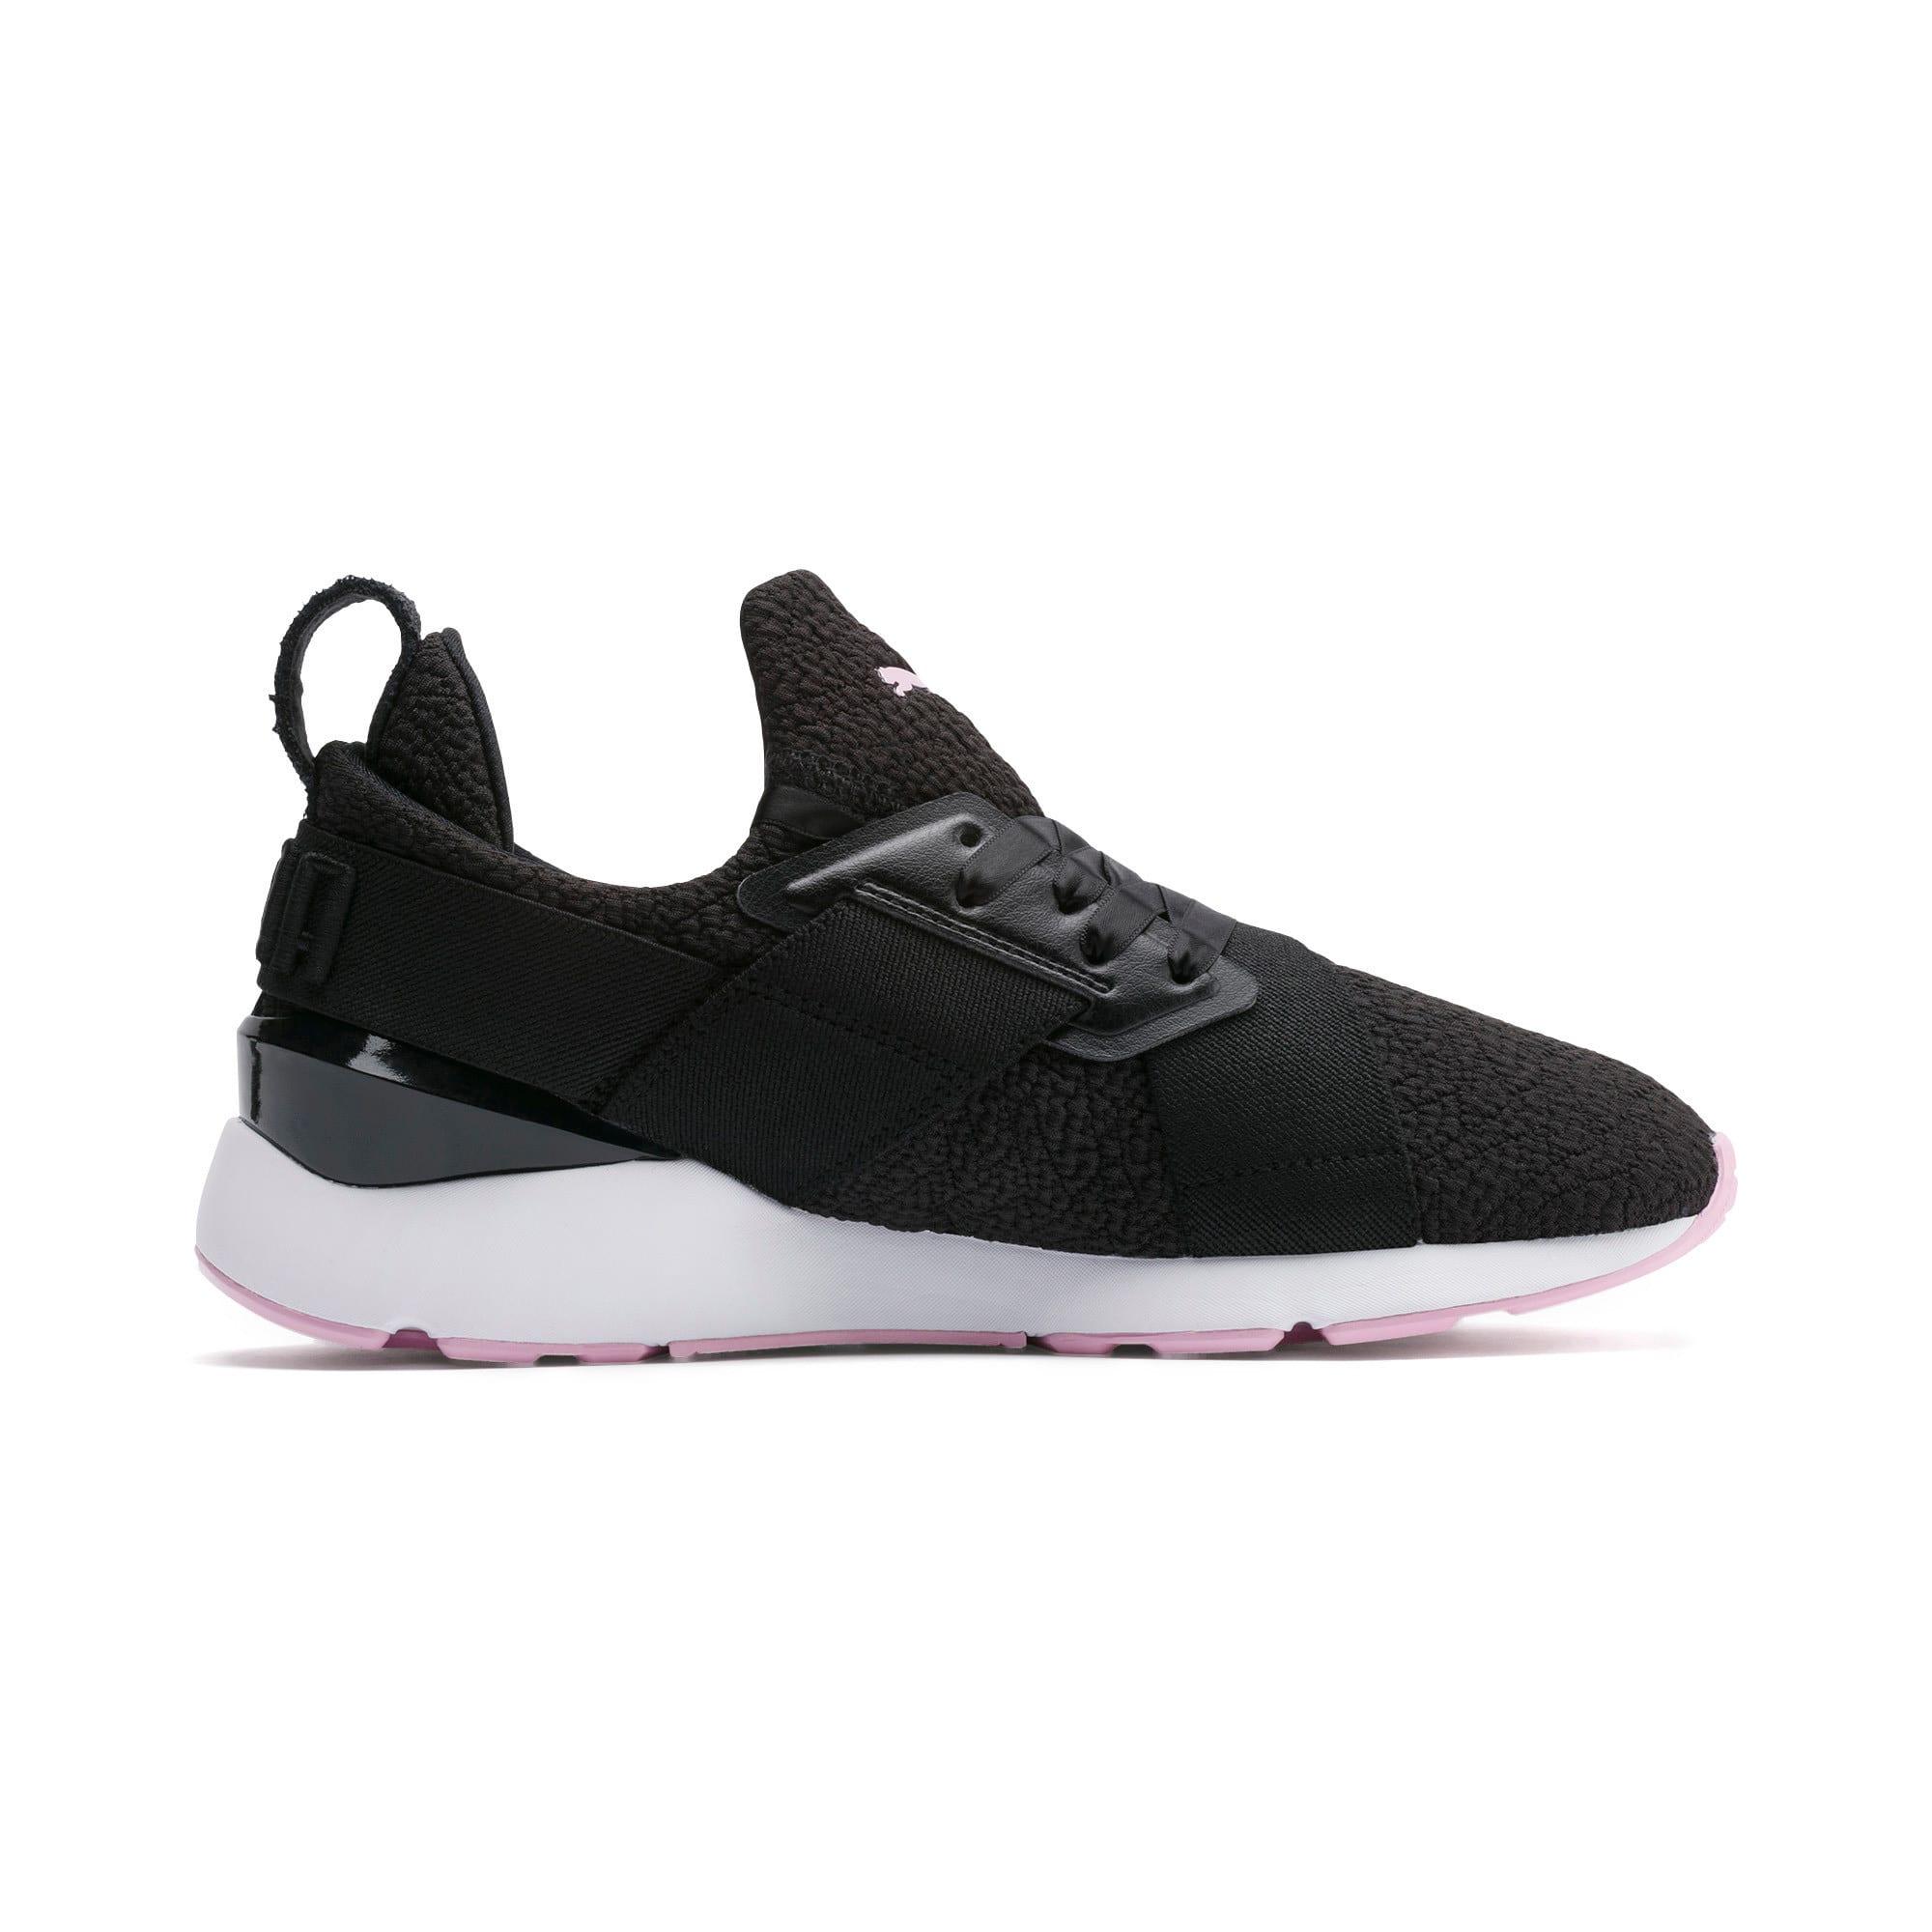 Thumbnail 5 of Muse TZ Damen Sneaker, Puma Black-Pale Pink, medium